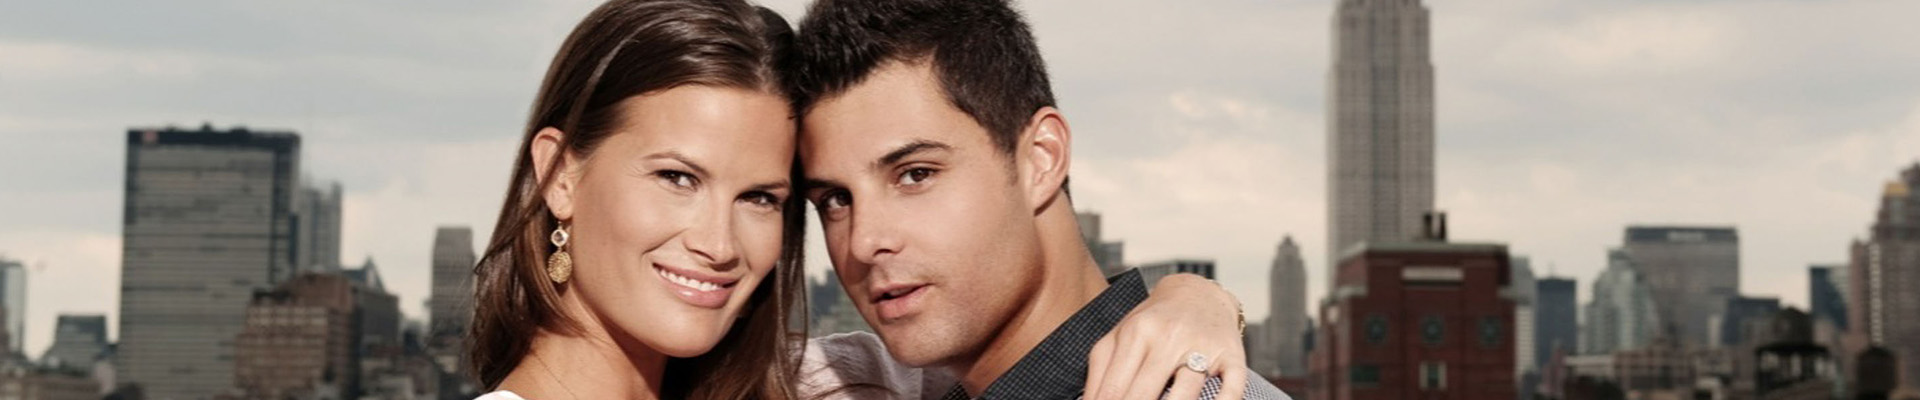 Engagement Photography - Daniel